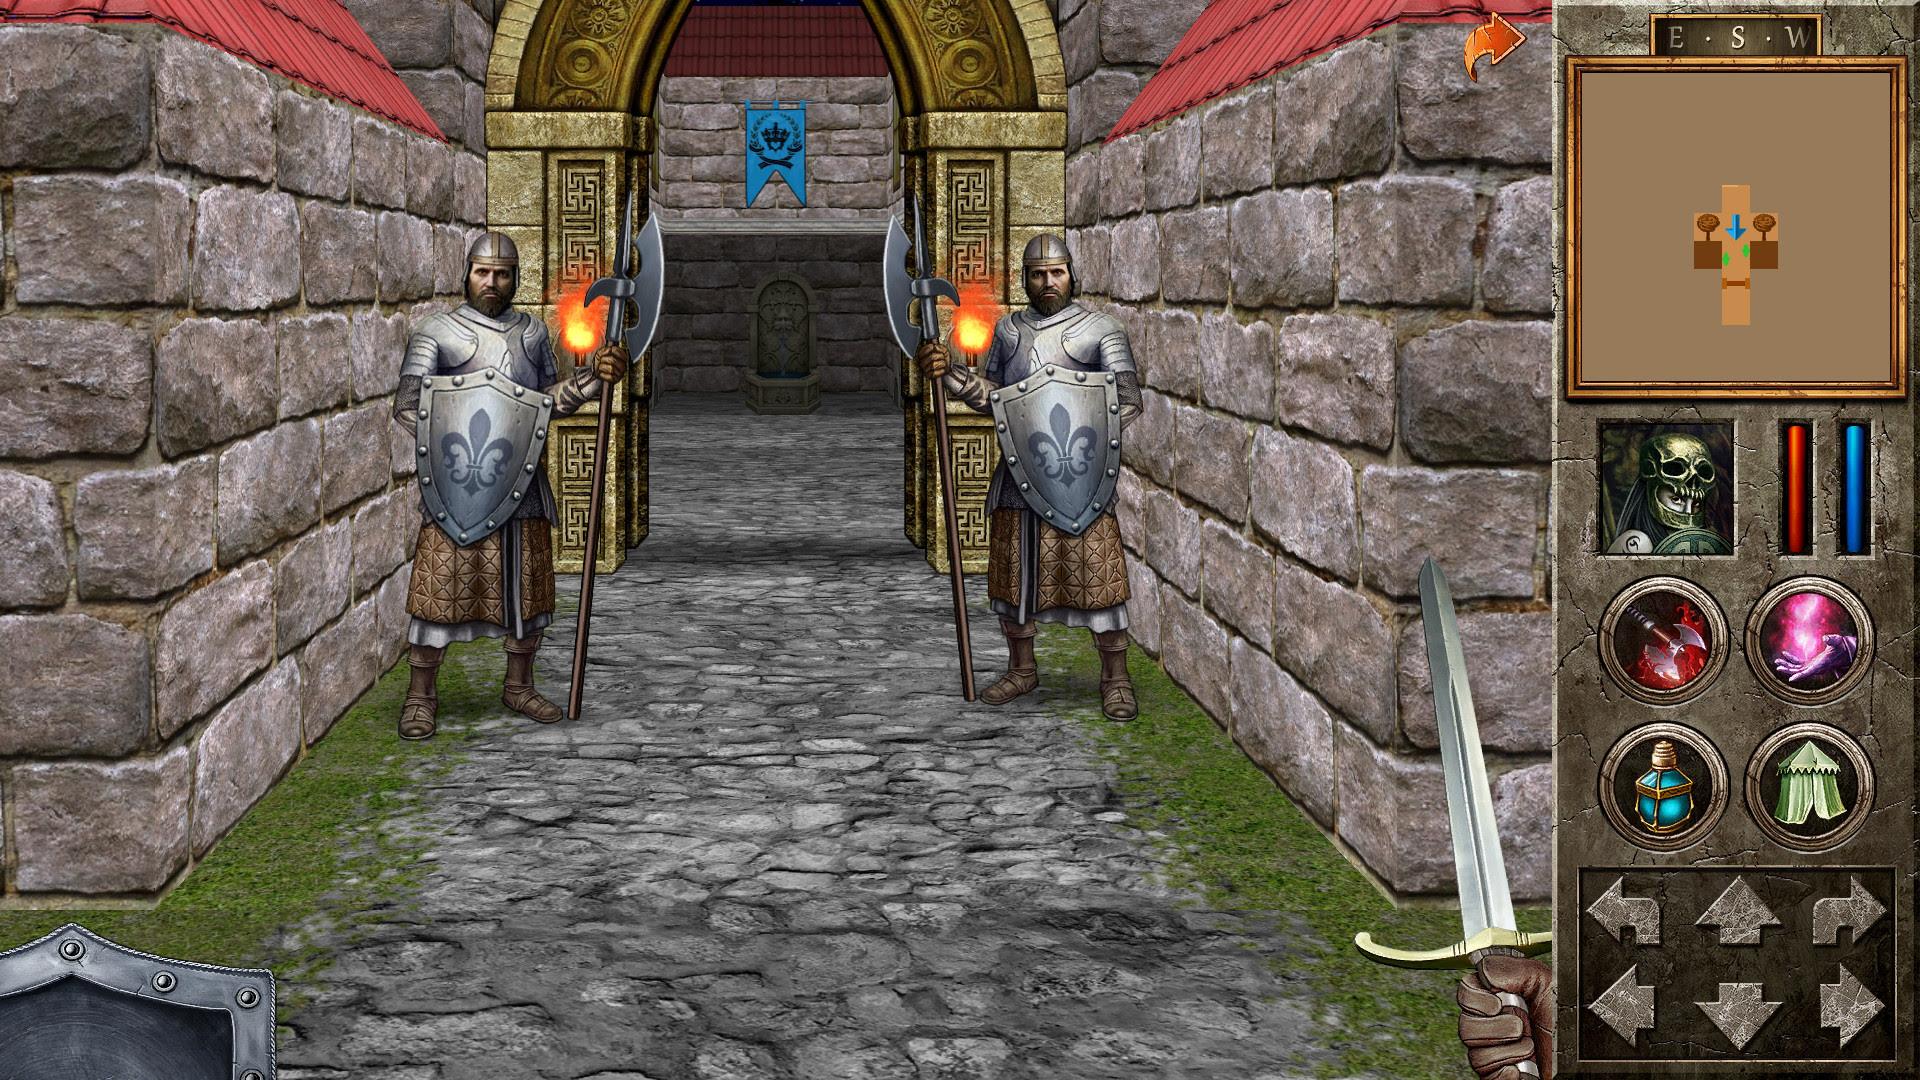 Free download game pc yang bisa pake joystick di